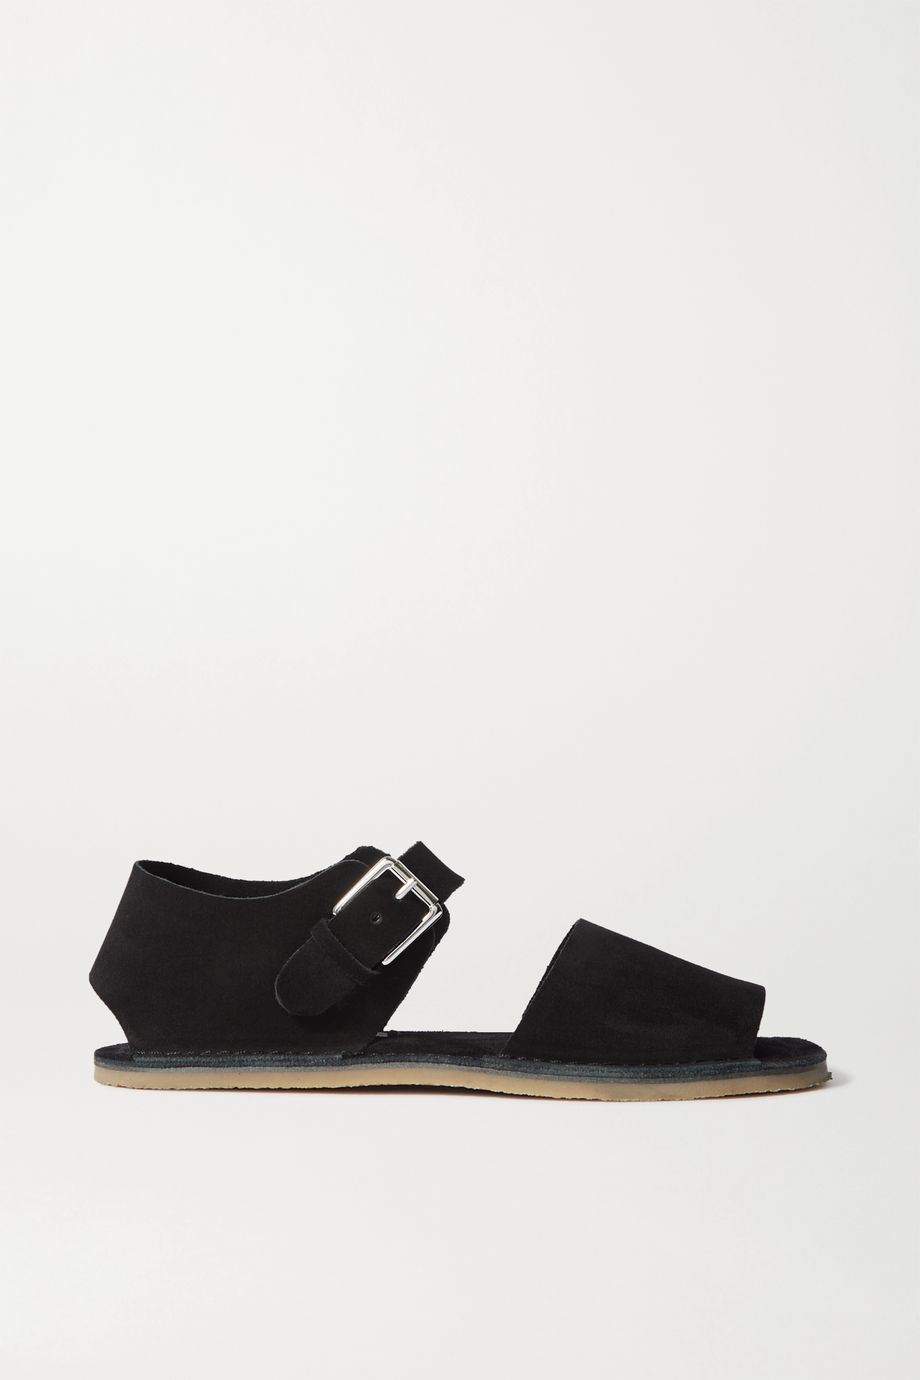 Acne Studios 绒面革凉鞋